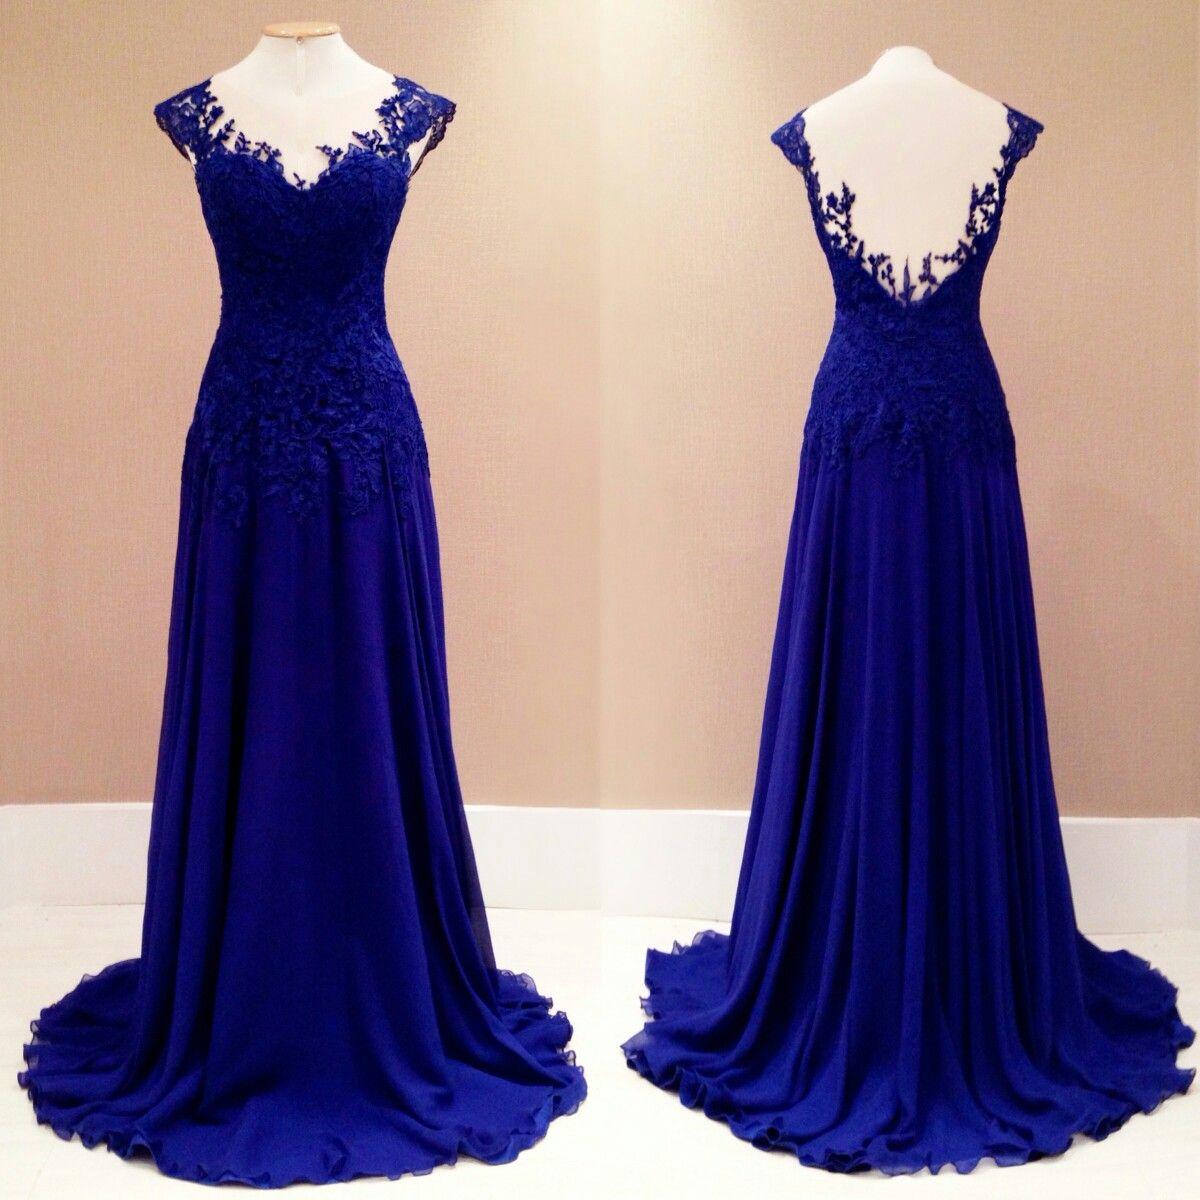 Lace dress royal blue  Pin by Maria Luísa Mackowiak on Vestidos  Pinterest